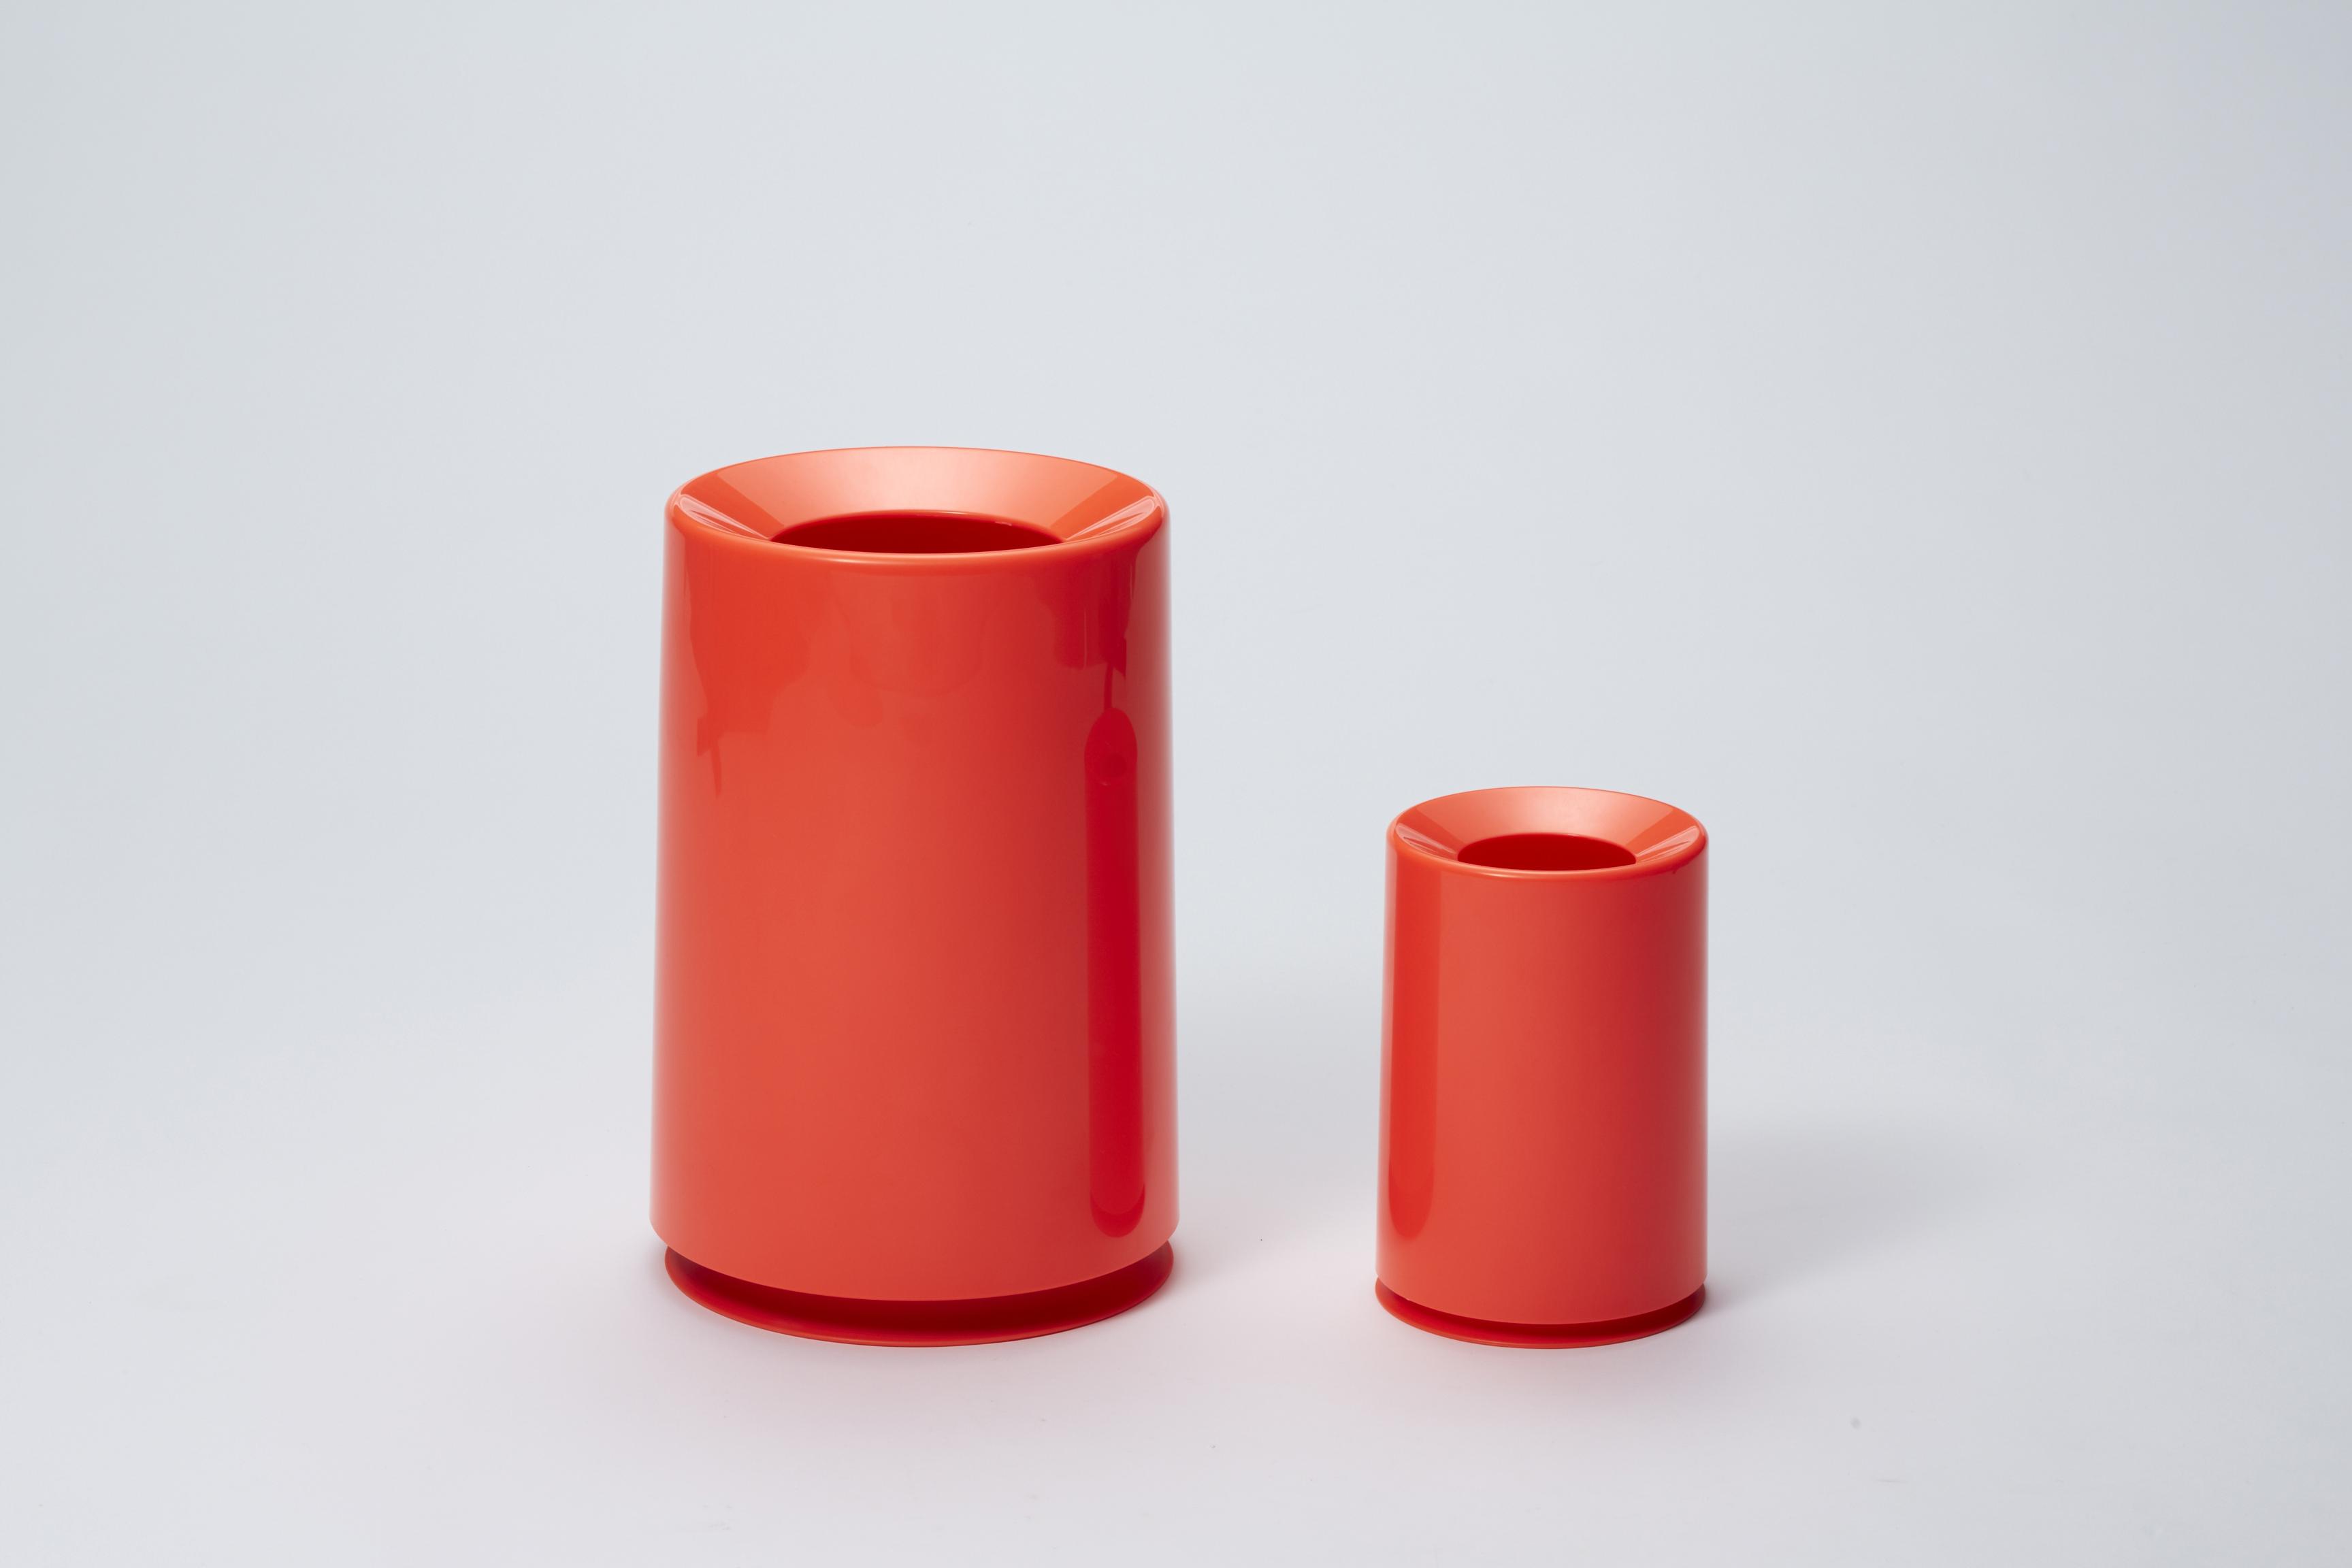 ideaco TUBELOR Trash Can - WEIMAR - weimarbiotech.com